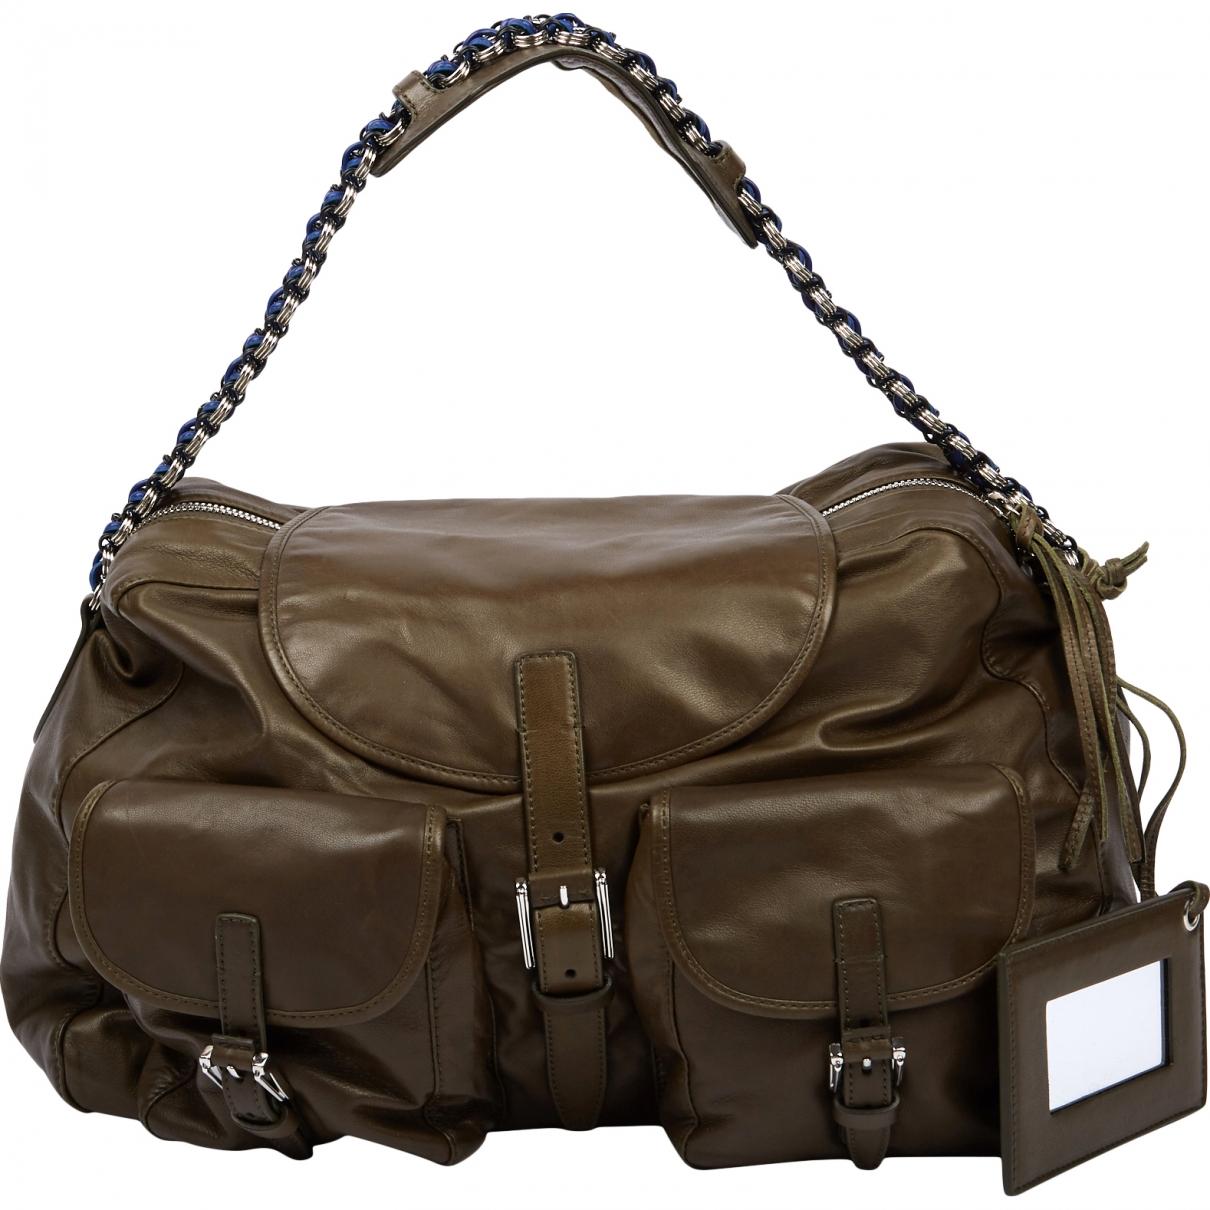 Balenciaga \N Khaki Leather handbag for Women \N